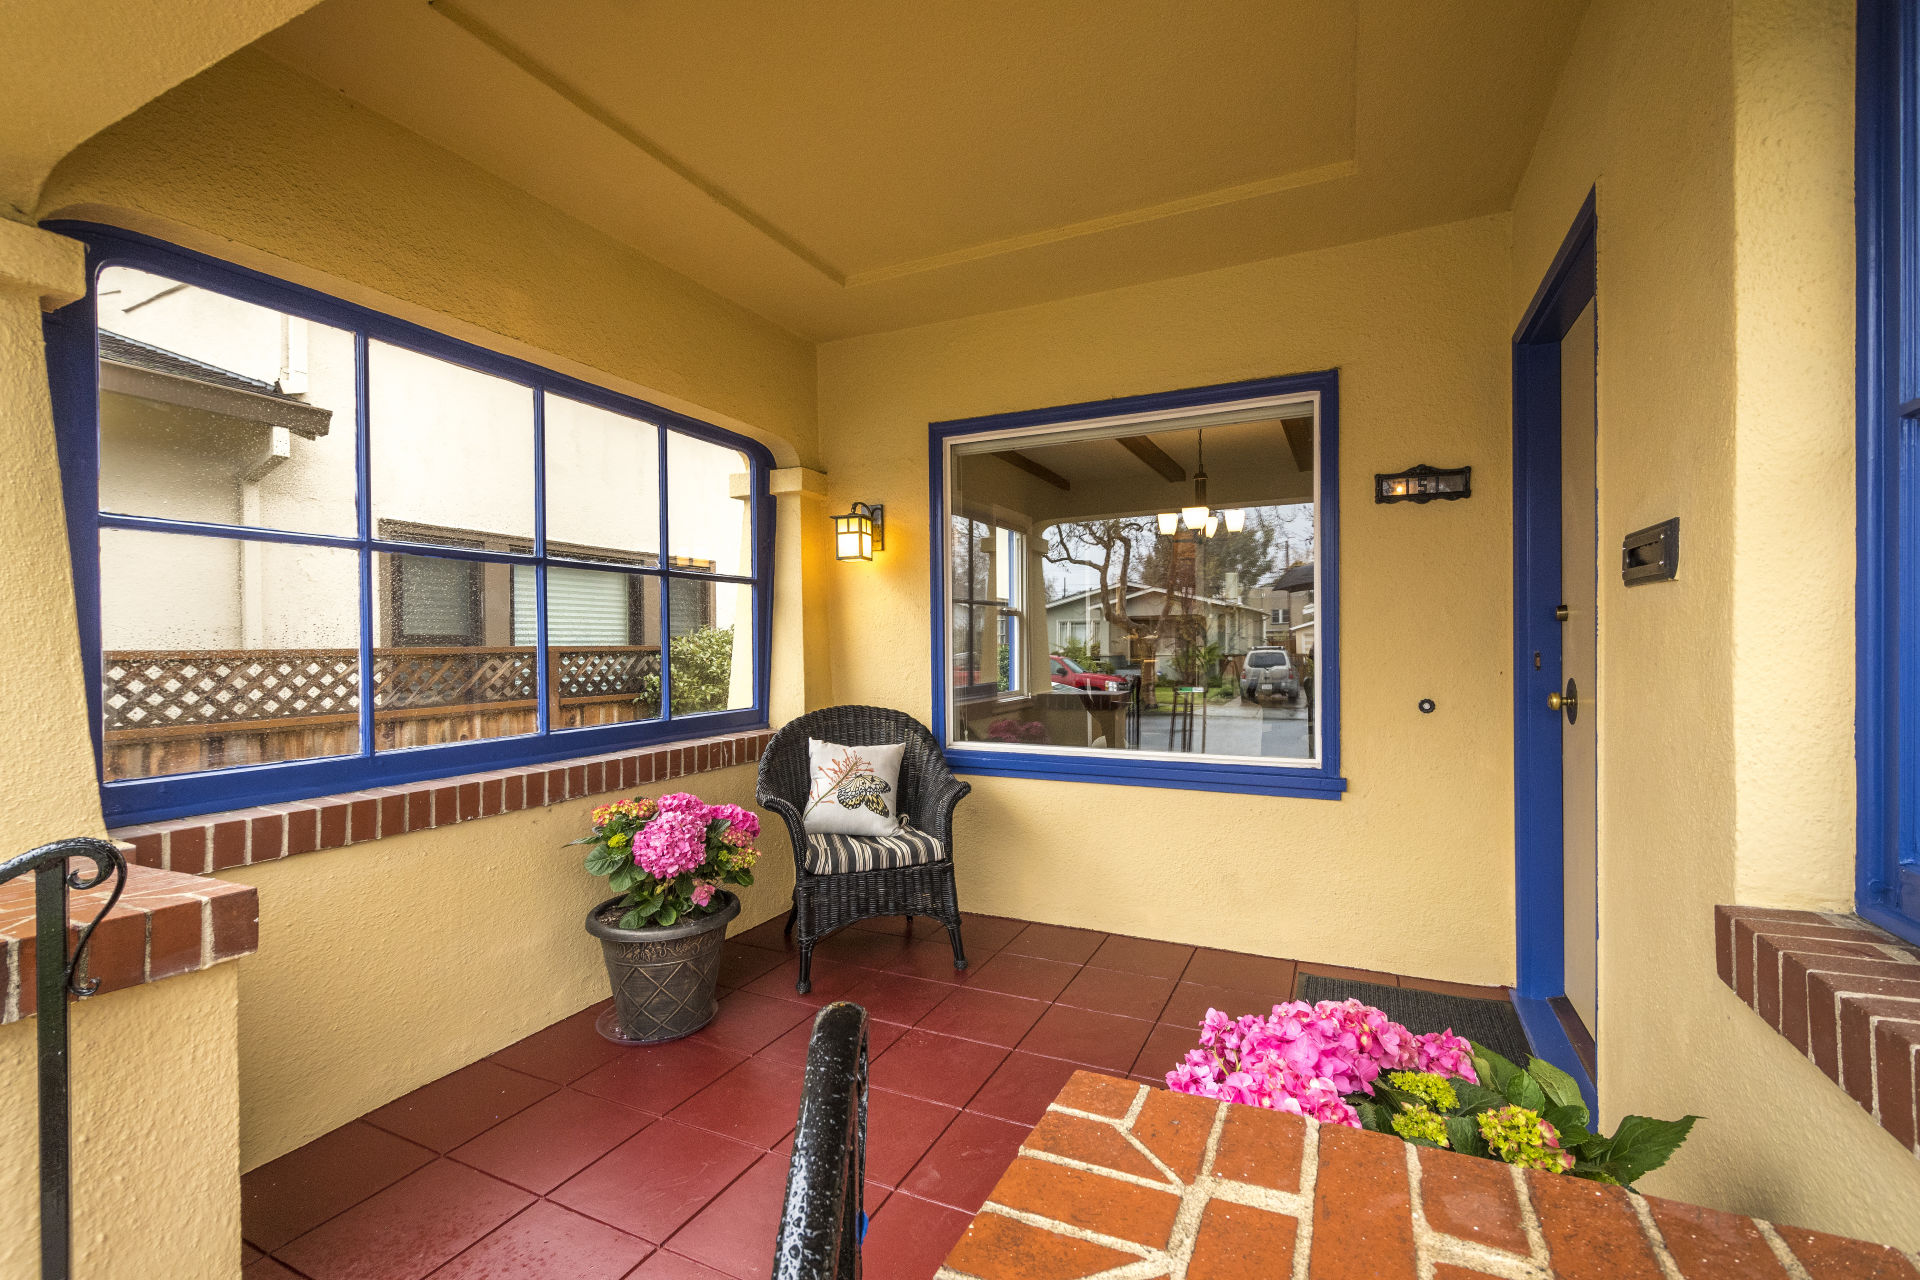 151 15th Ave., San Mateo – Hayward Park Neighborhood JUST SOLD